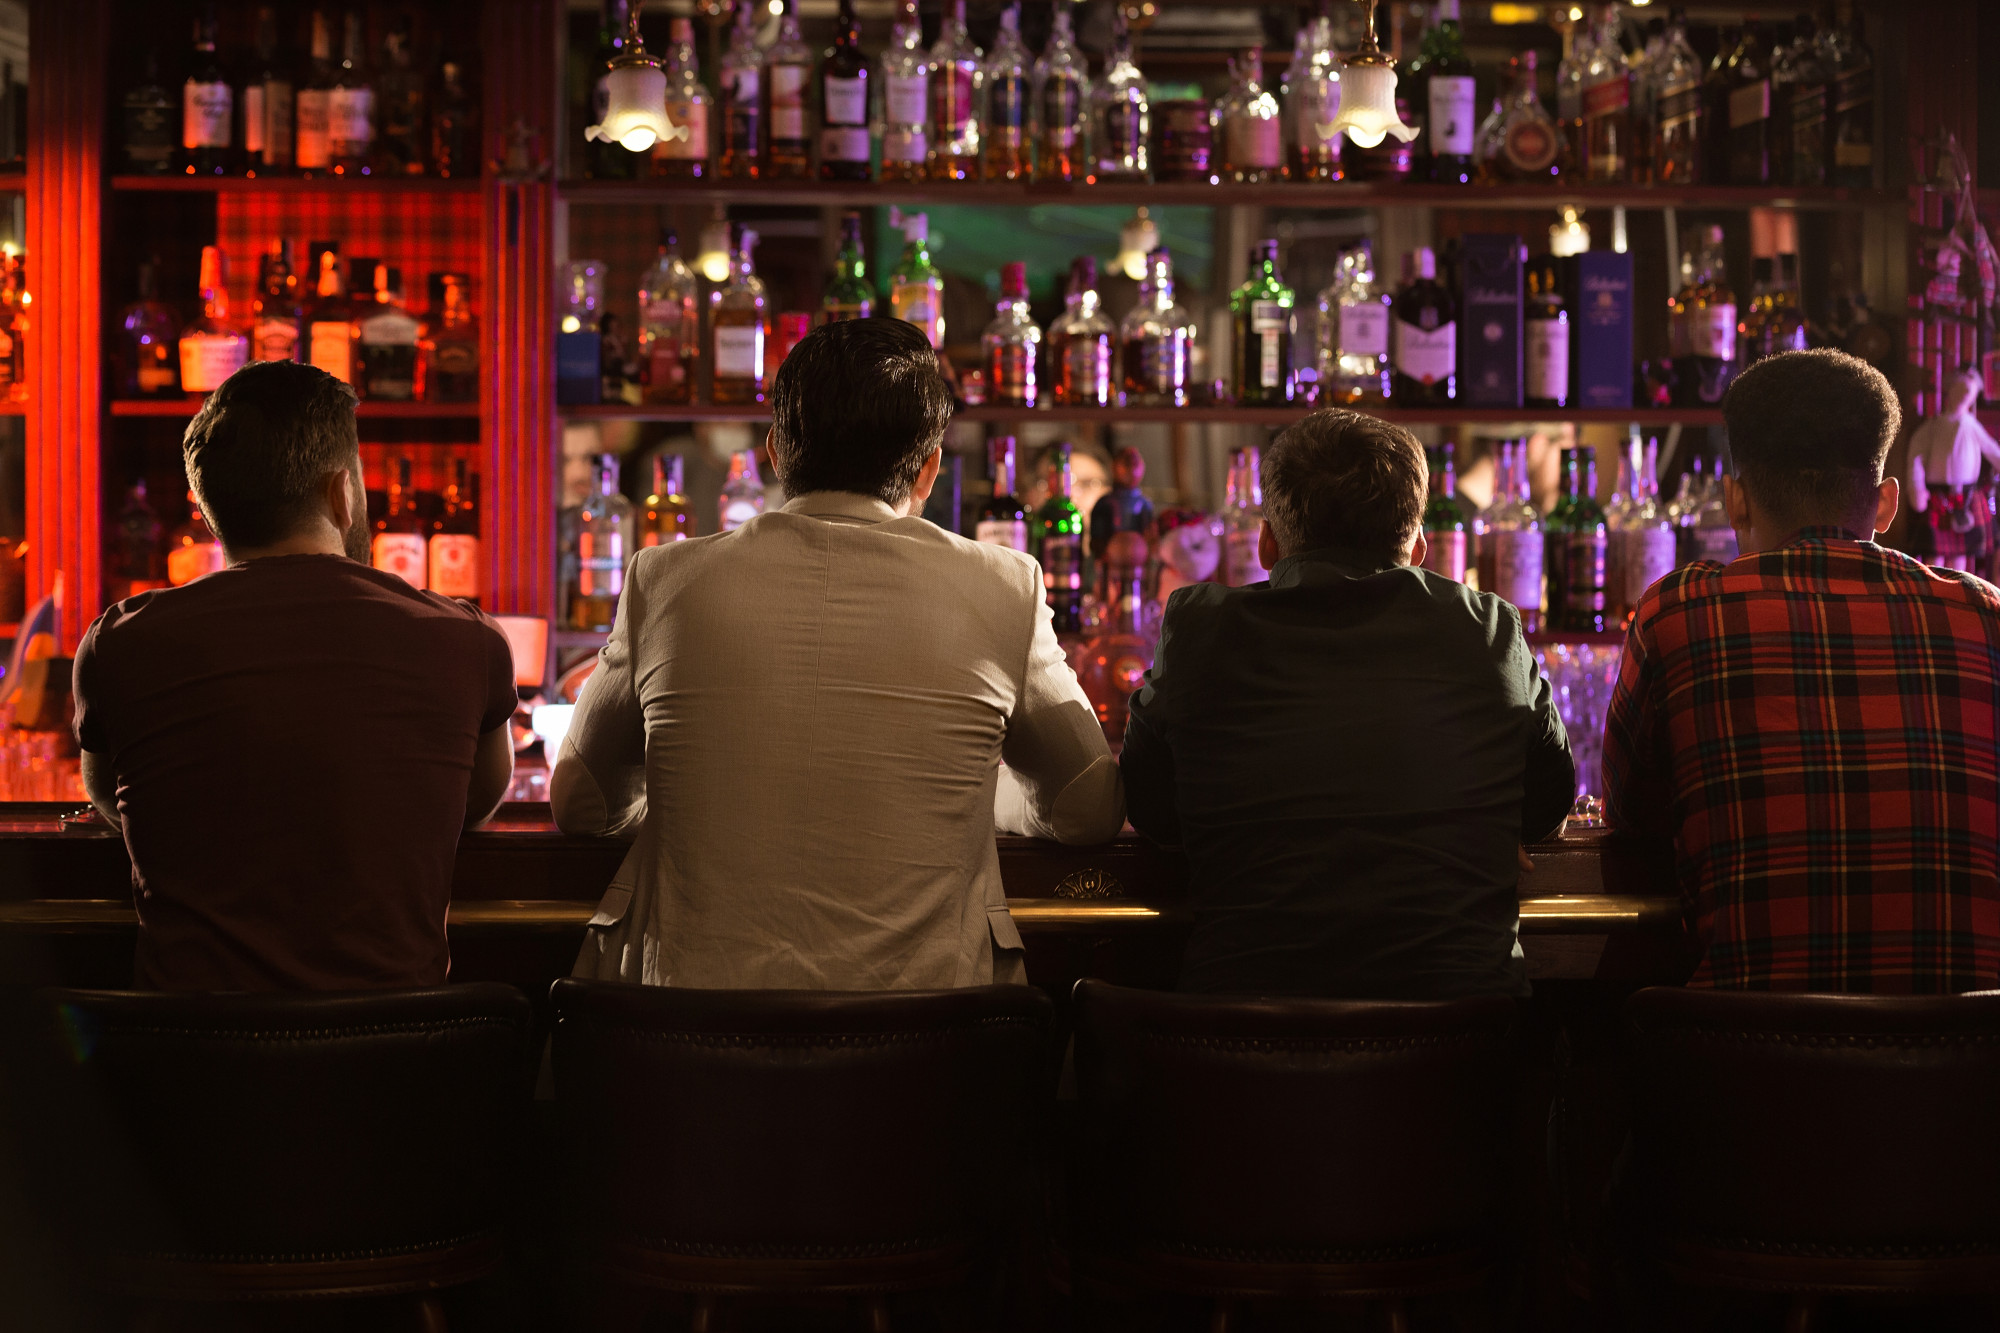 Four men sitting along the bar counter